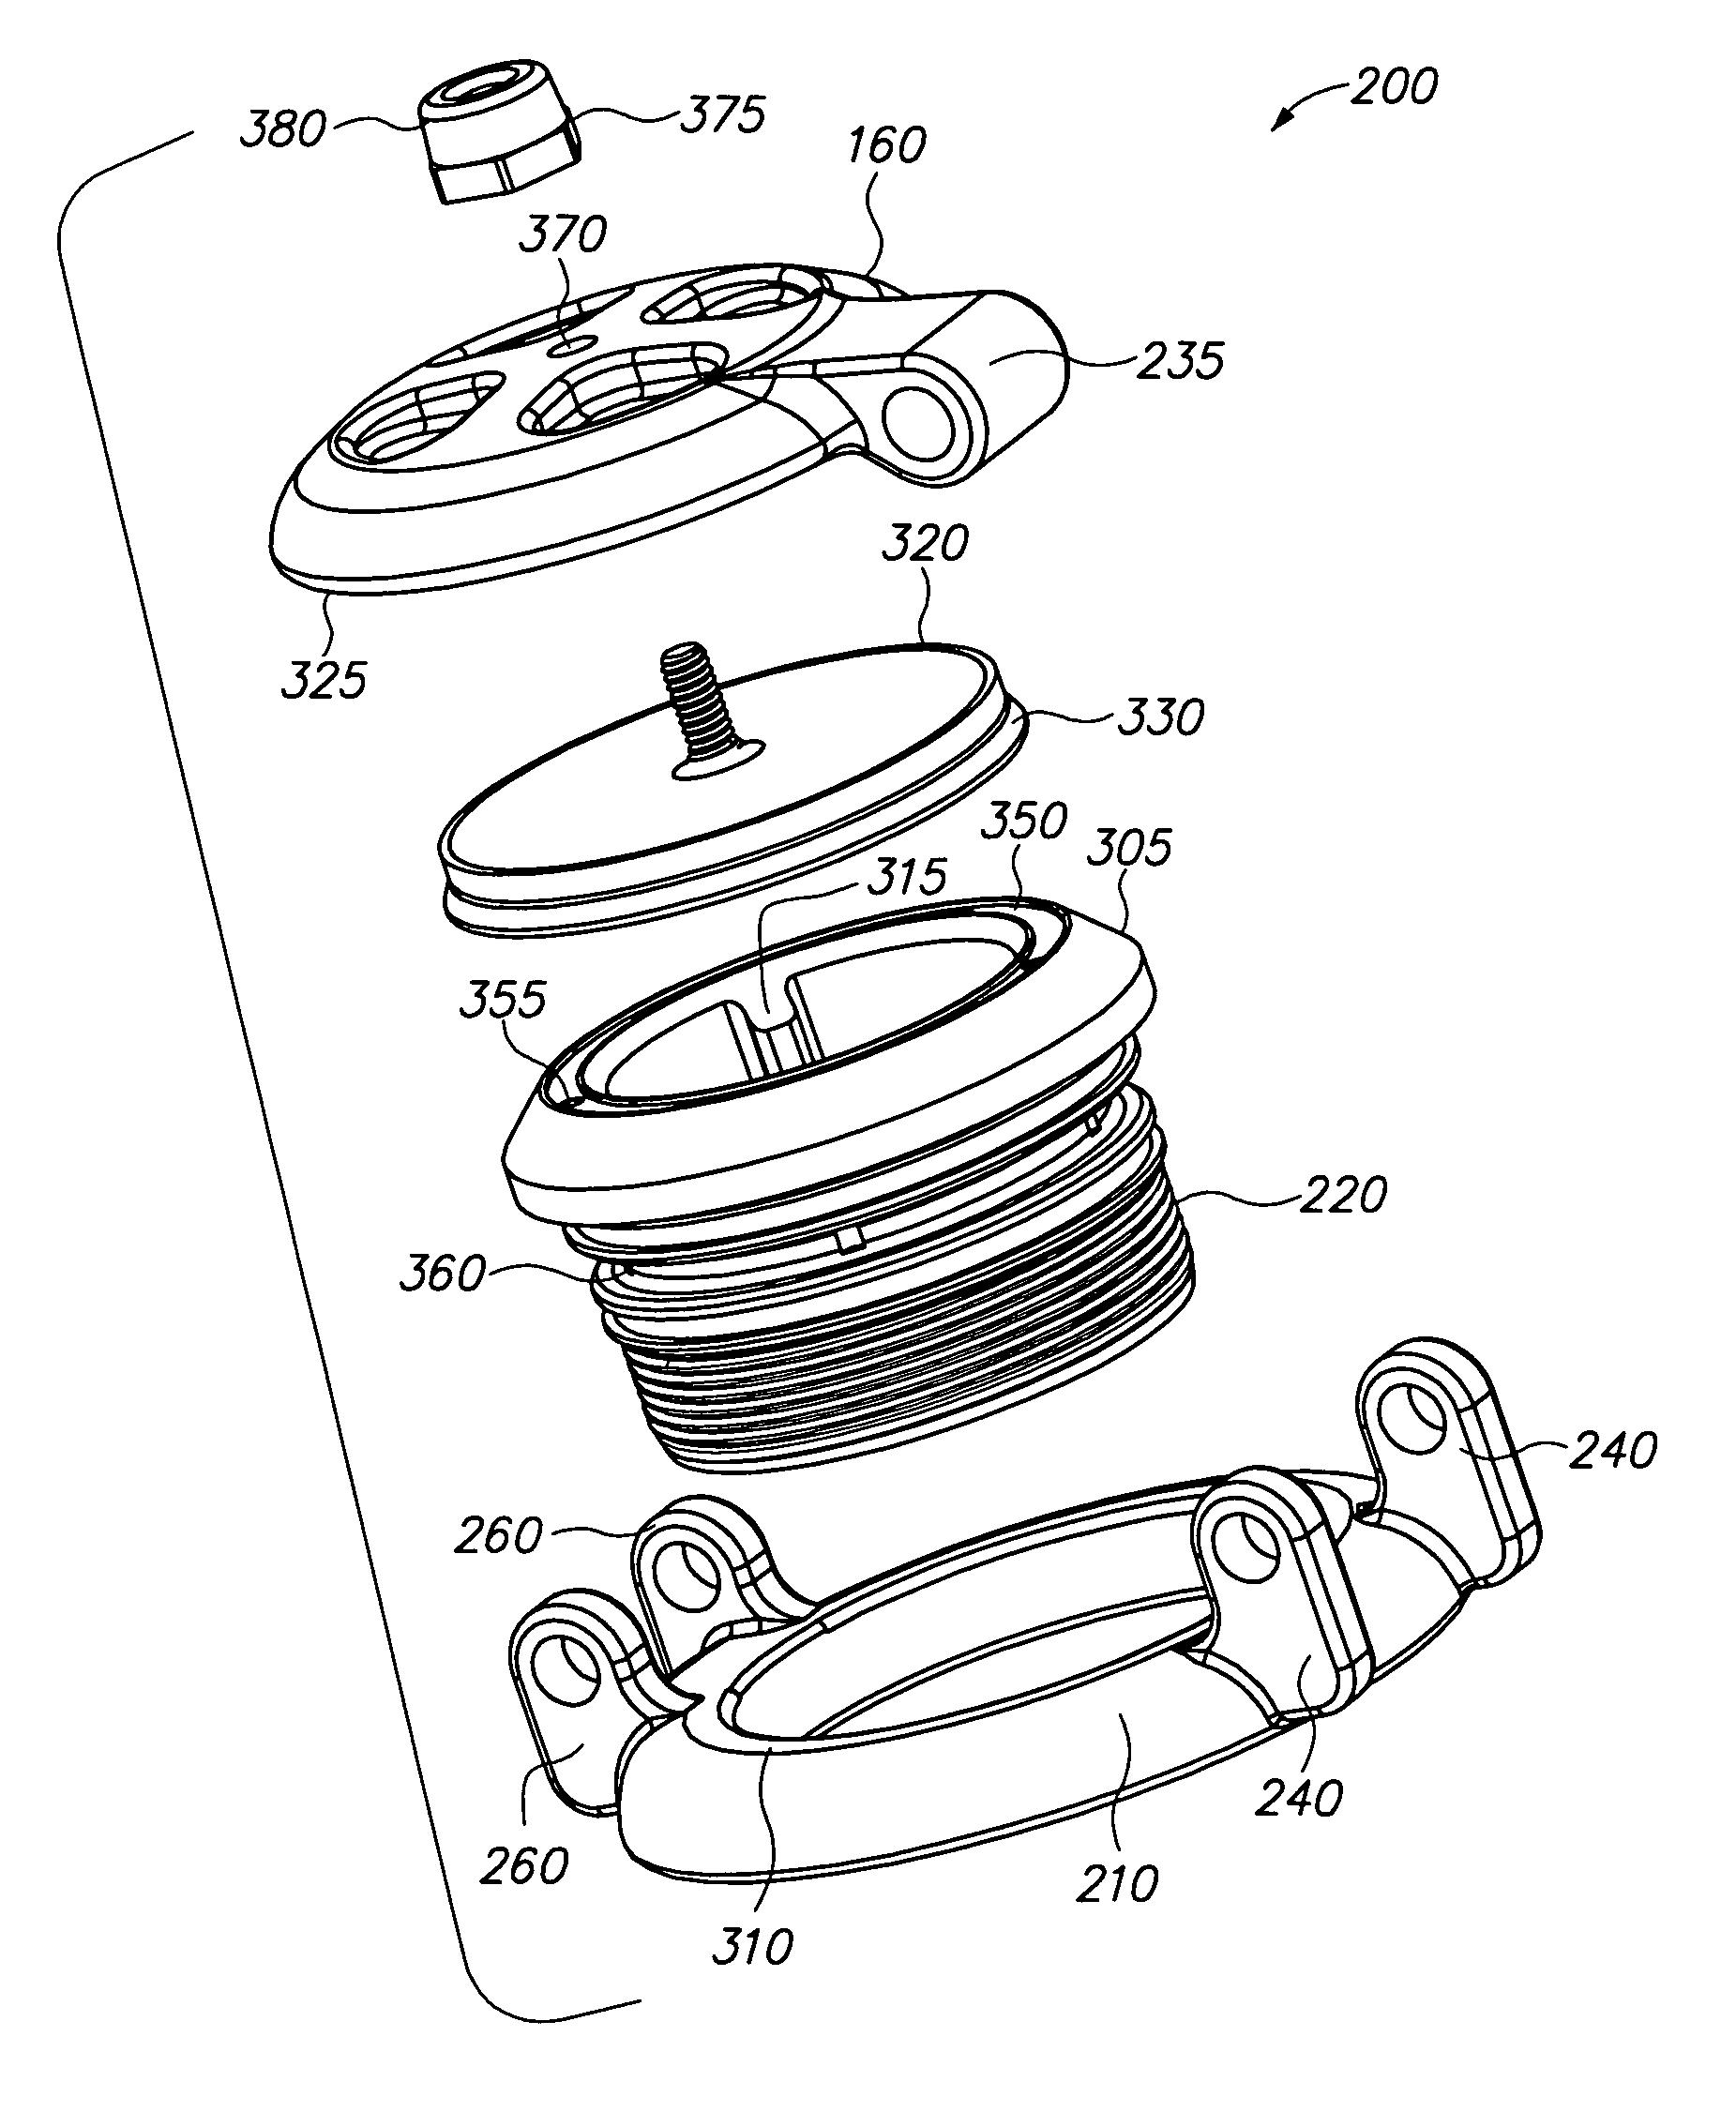 Sprinkler Wiring Diagram